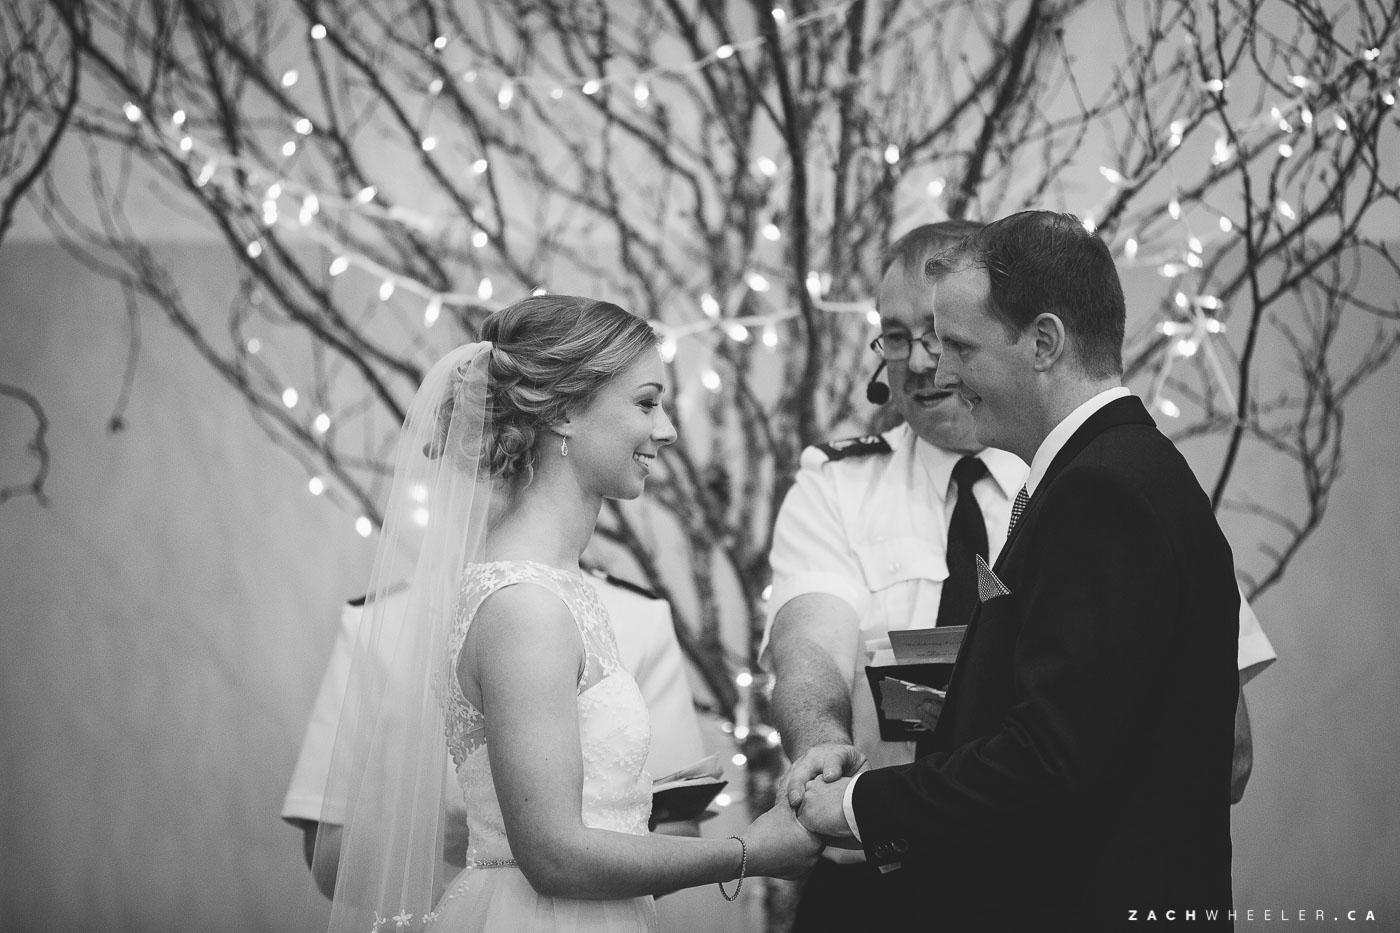 Sarah-Grant-Lesters-Fram-Wedding-35